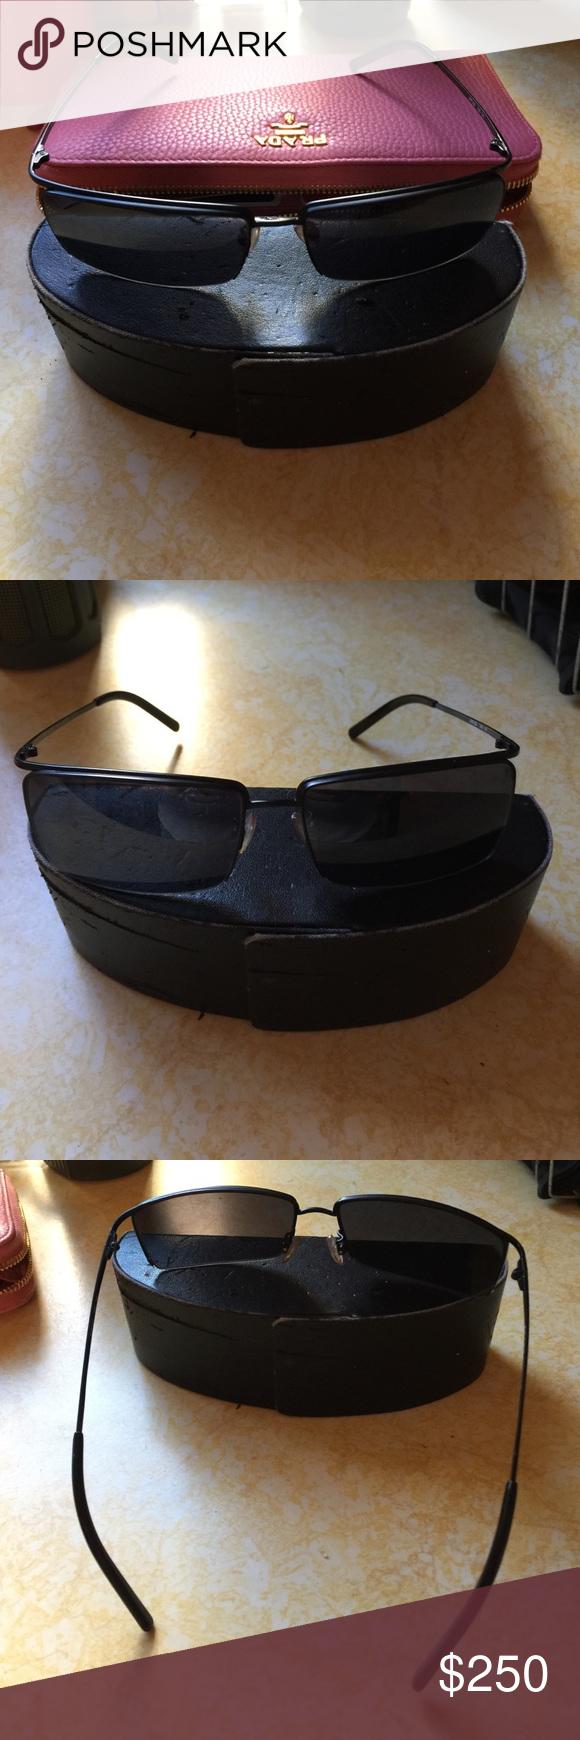 ac2e4c3ab36e5 greece beautiful prada sunglasses 34e2e c535d